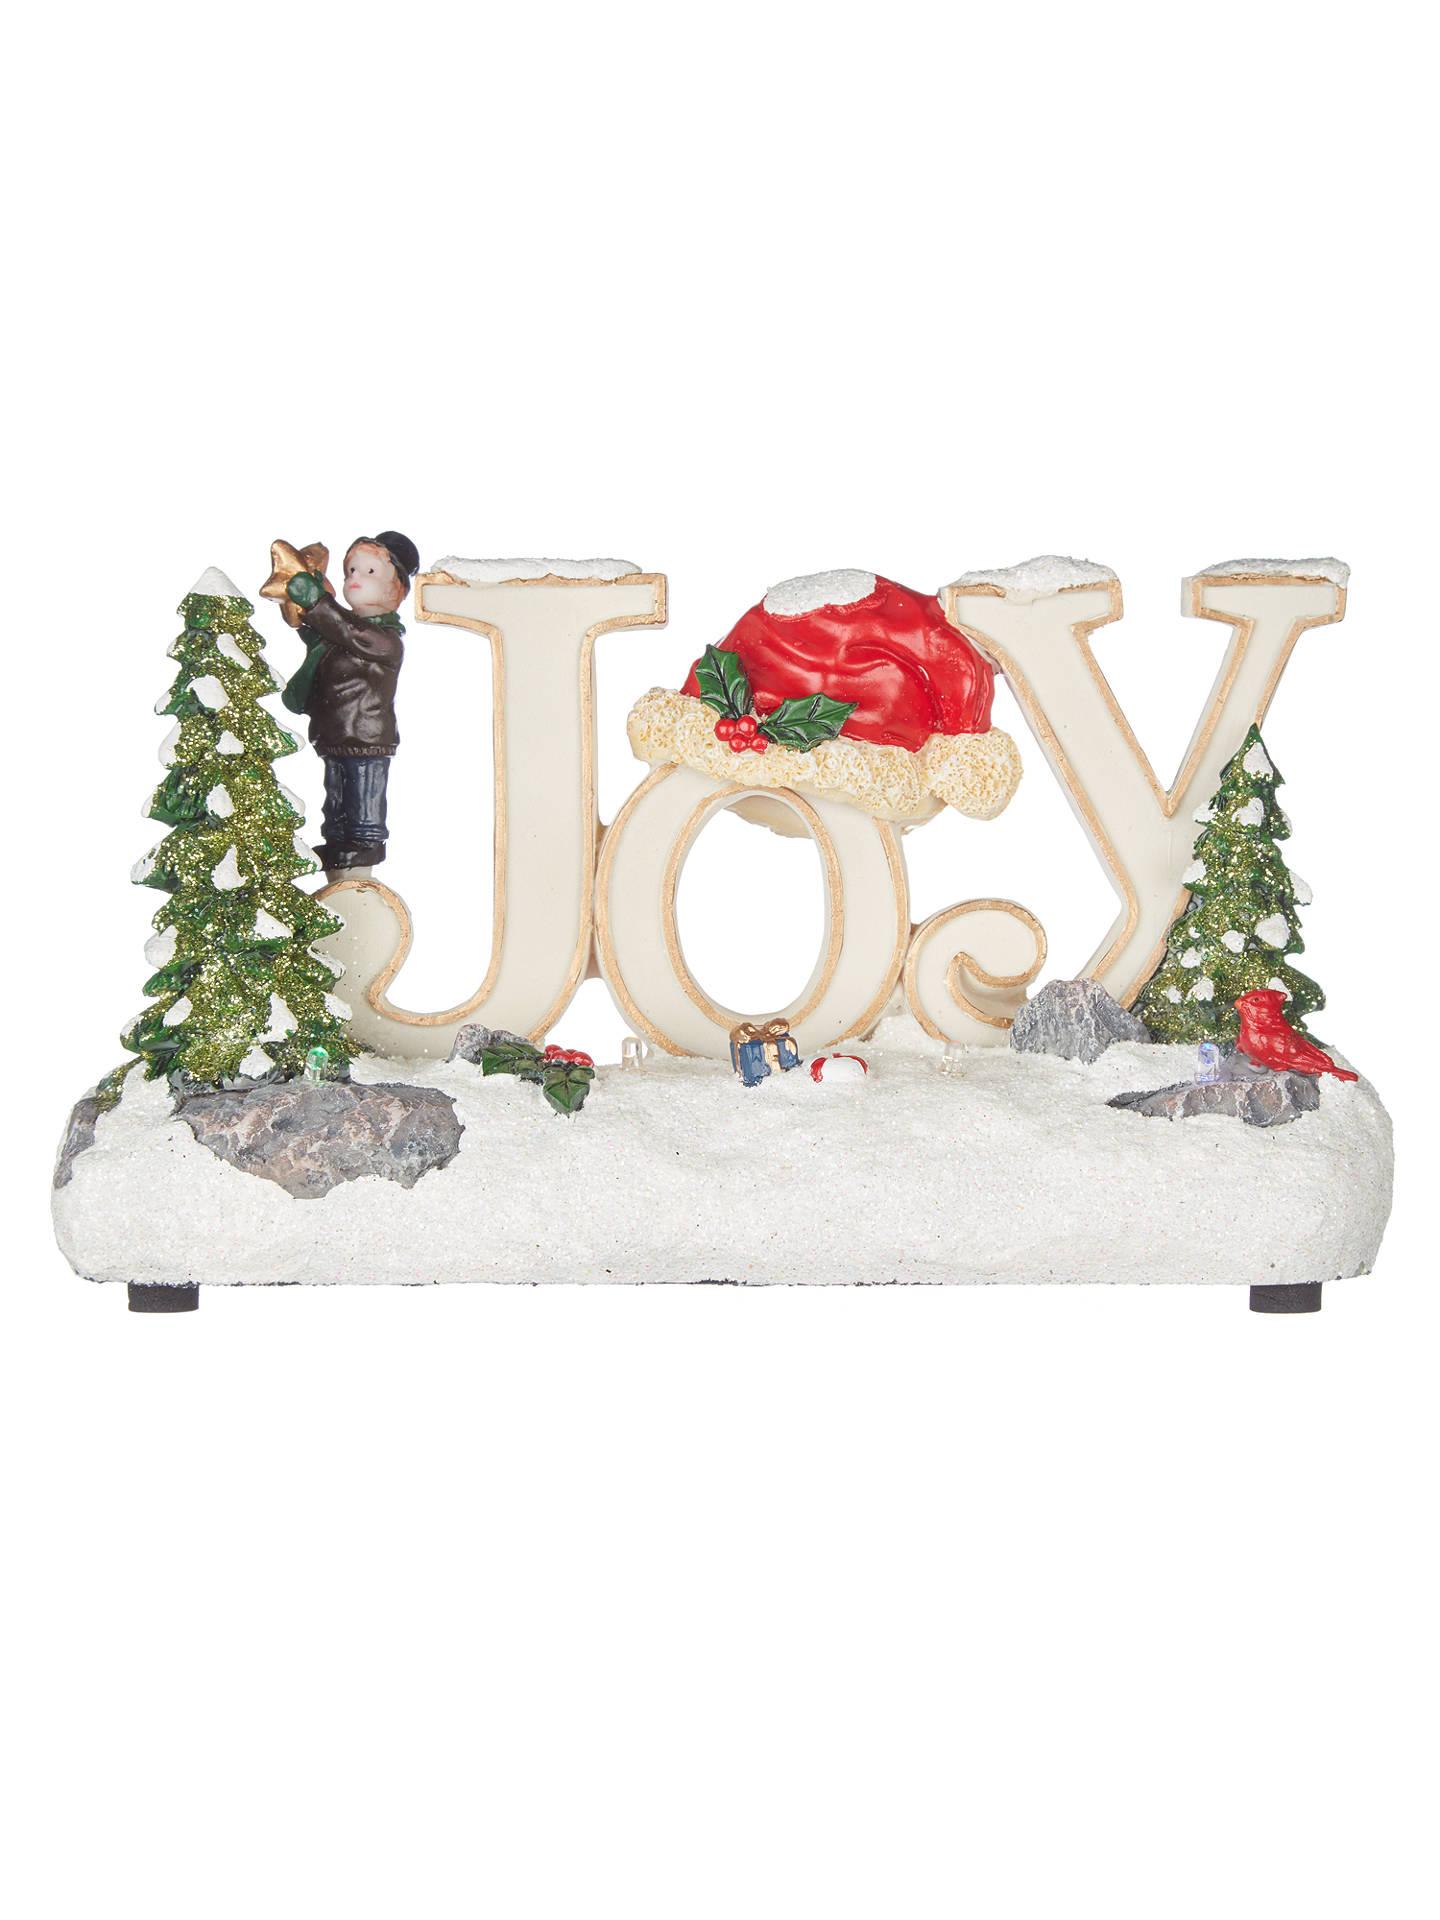 John Lewis LED Joy Christmas Ornament at John Lewis & Partners